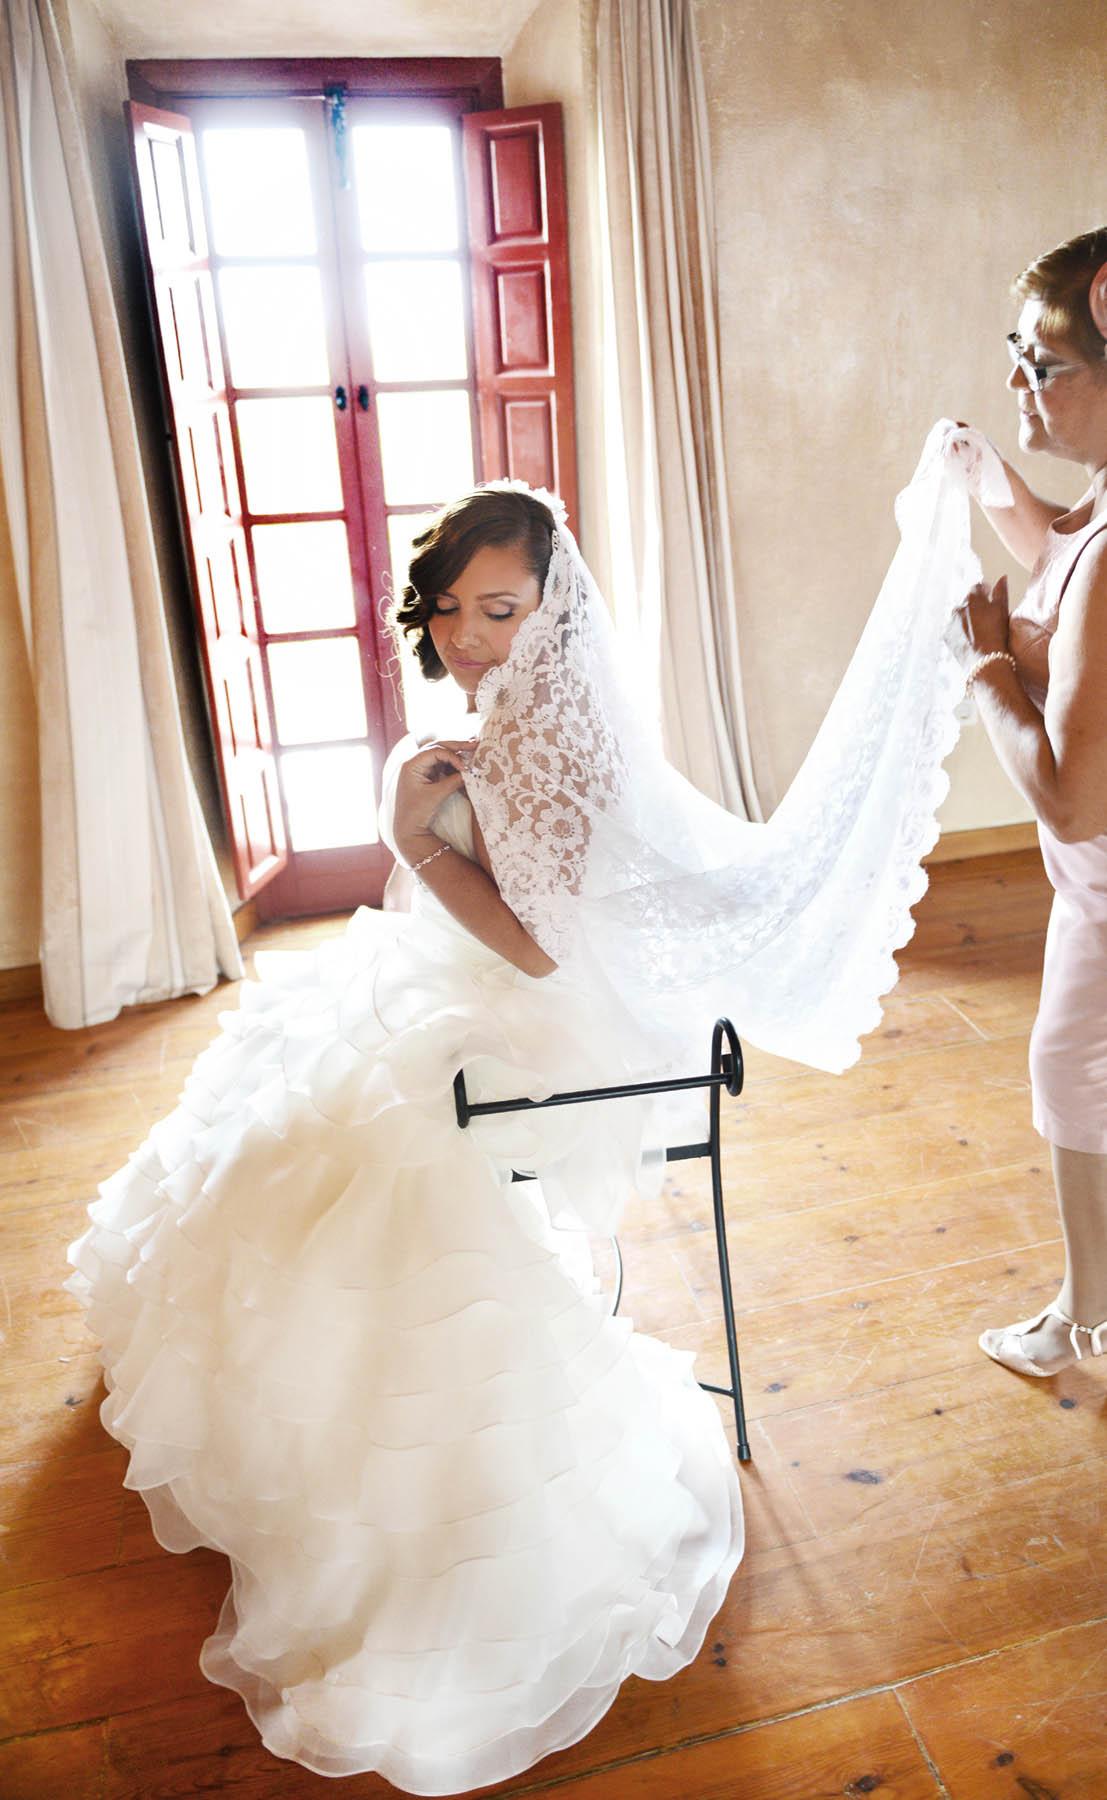 bride wedding photos alora